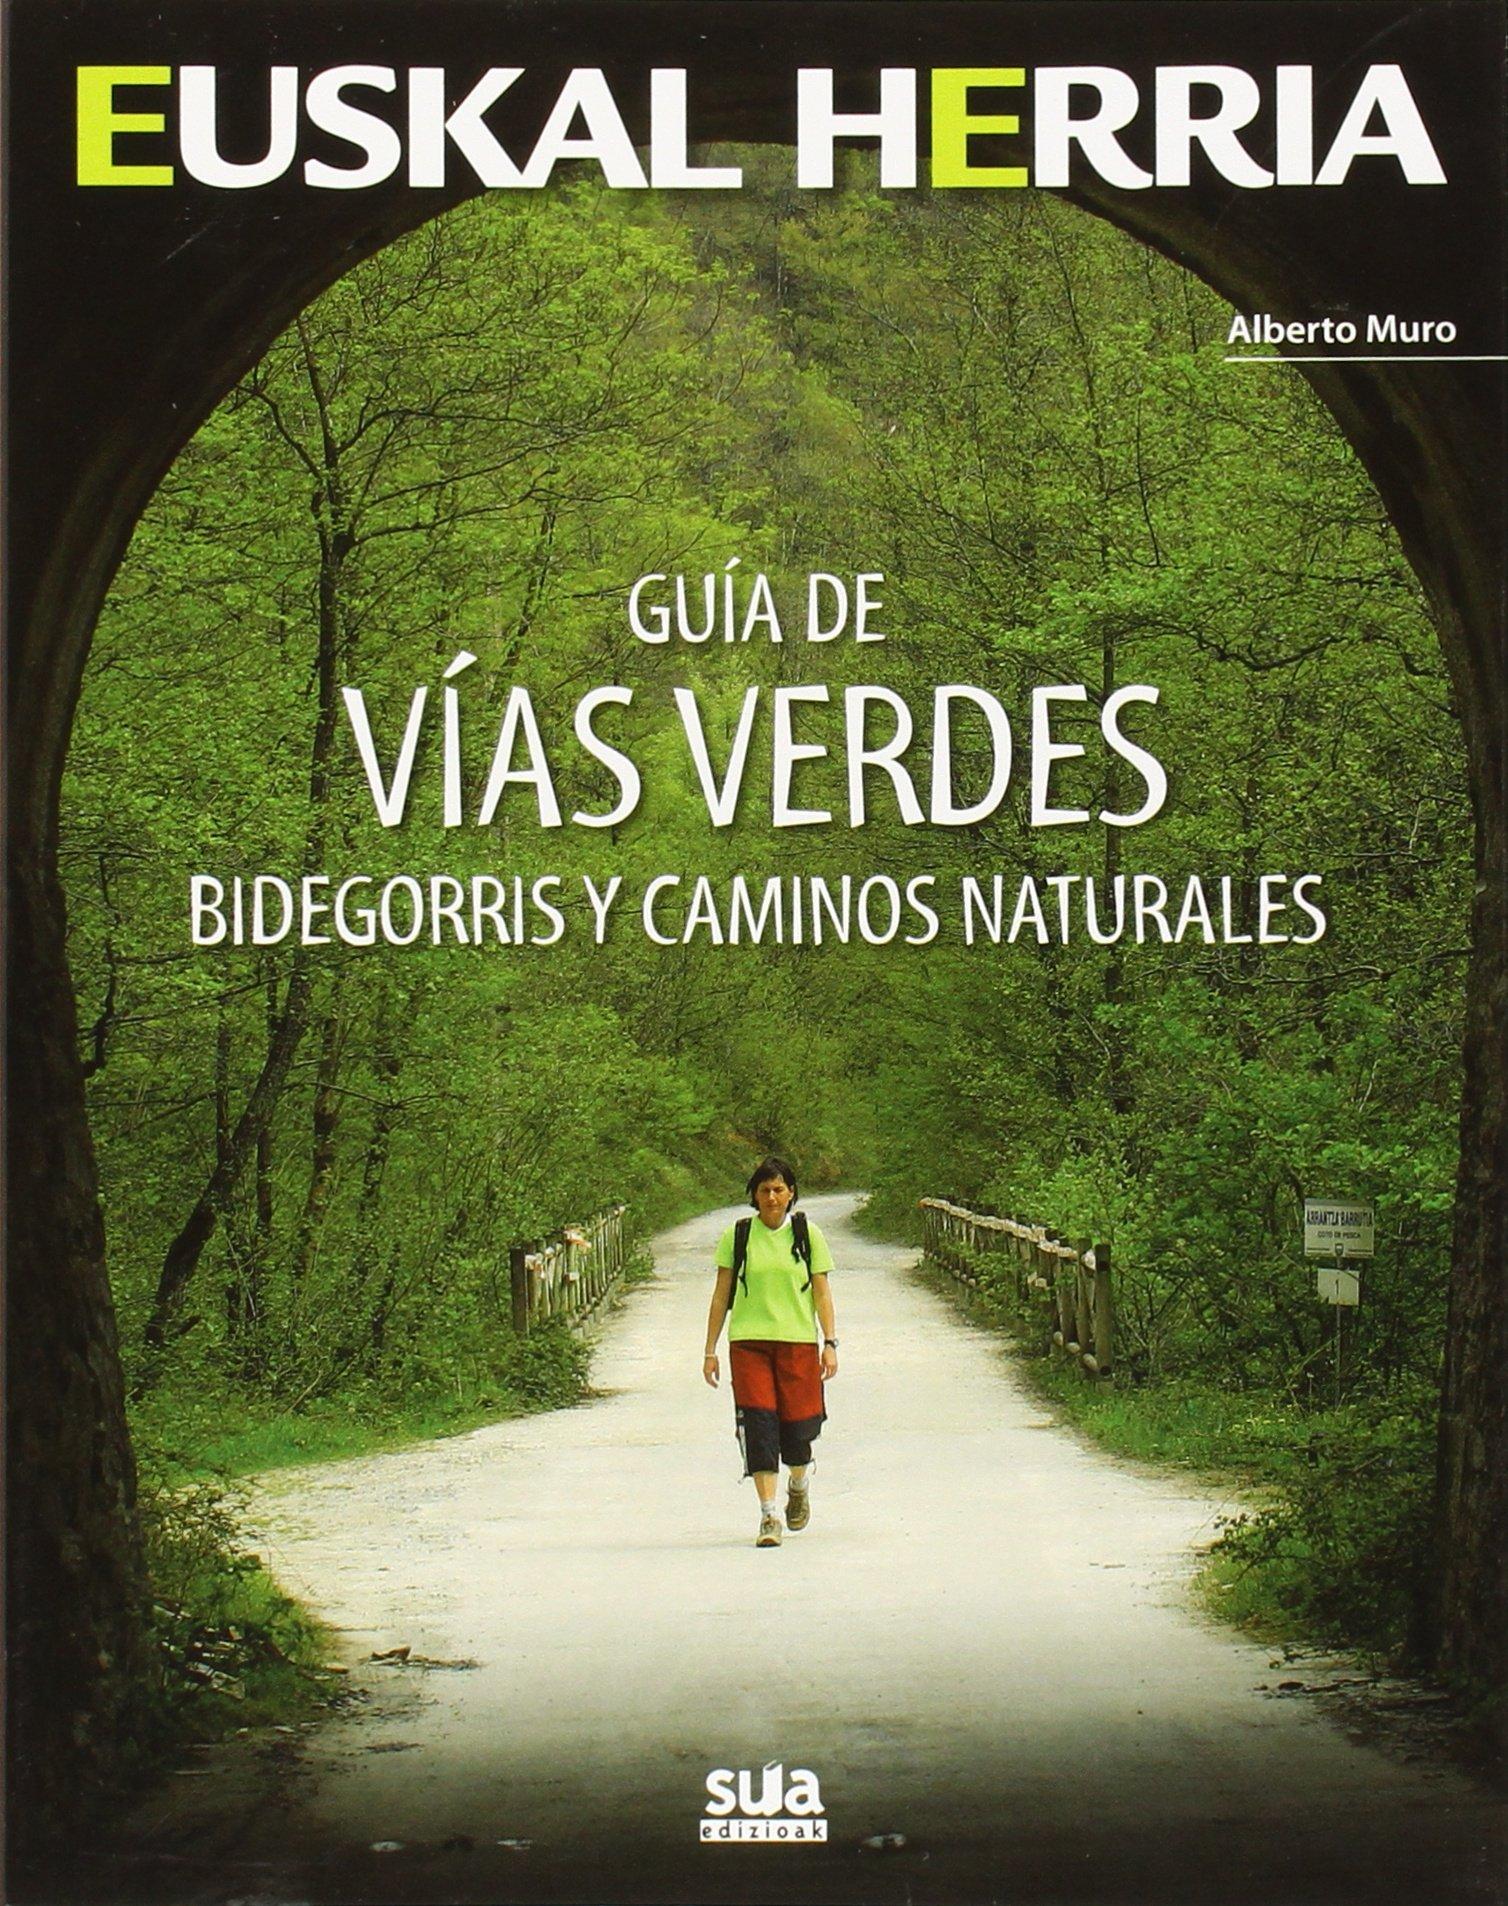 Guia de vias verdes: Bidegorris y caminos naturales (Euskal Herria) Tapa blanda – 15 feb 2015 Alberto Muro Pereg Sua Edizioak 8482165739 Cycling